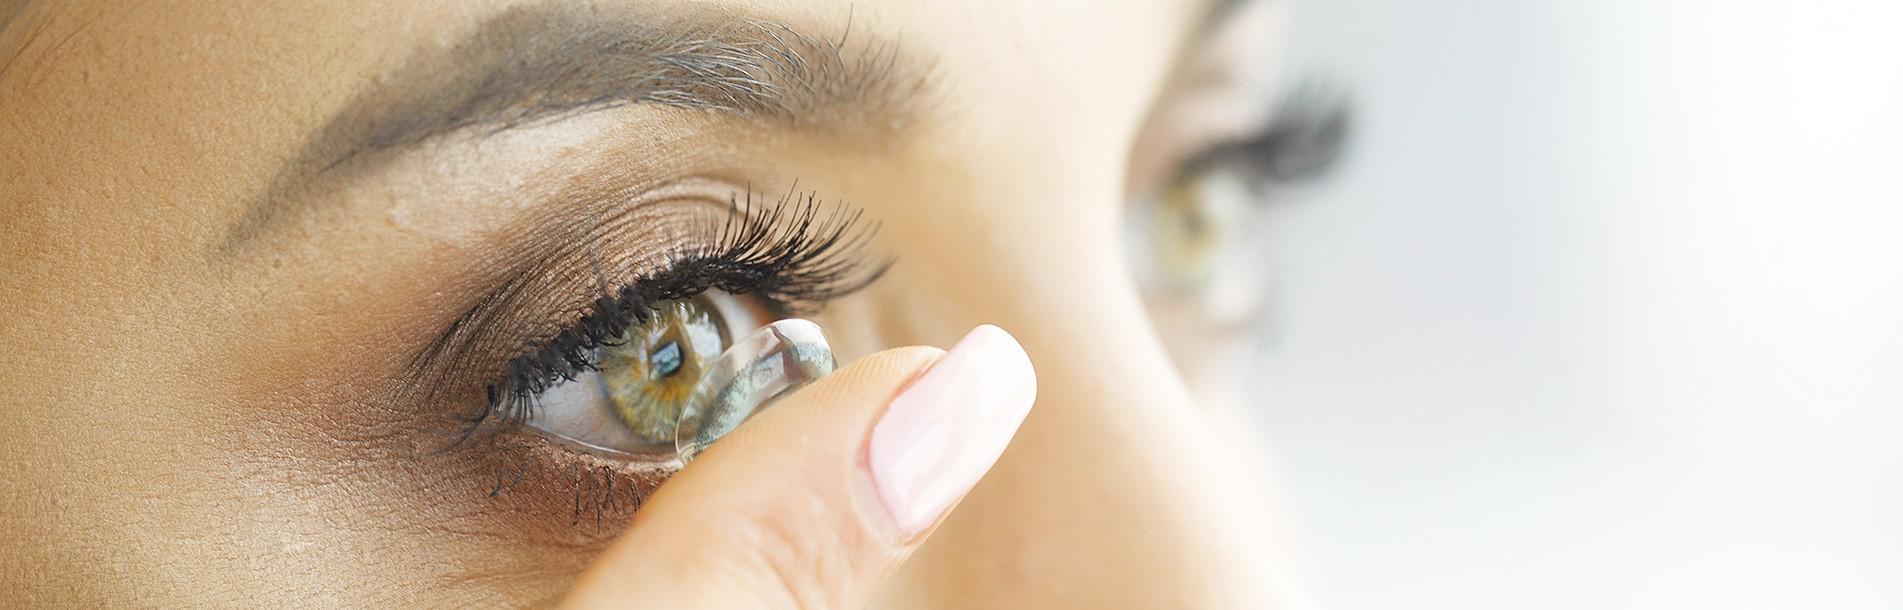 Argus Optik Kontaktlinsen